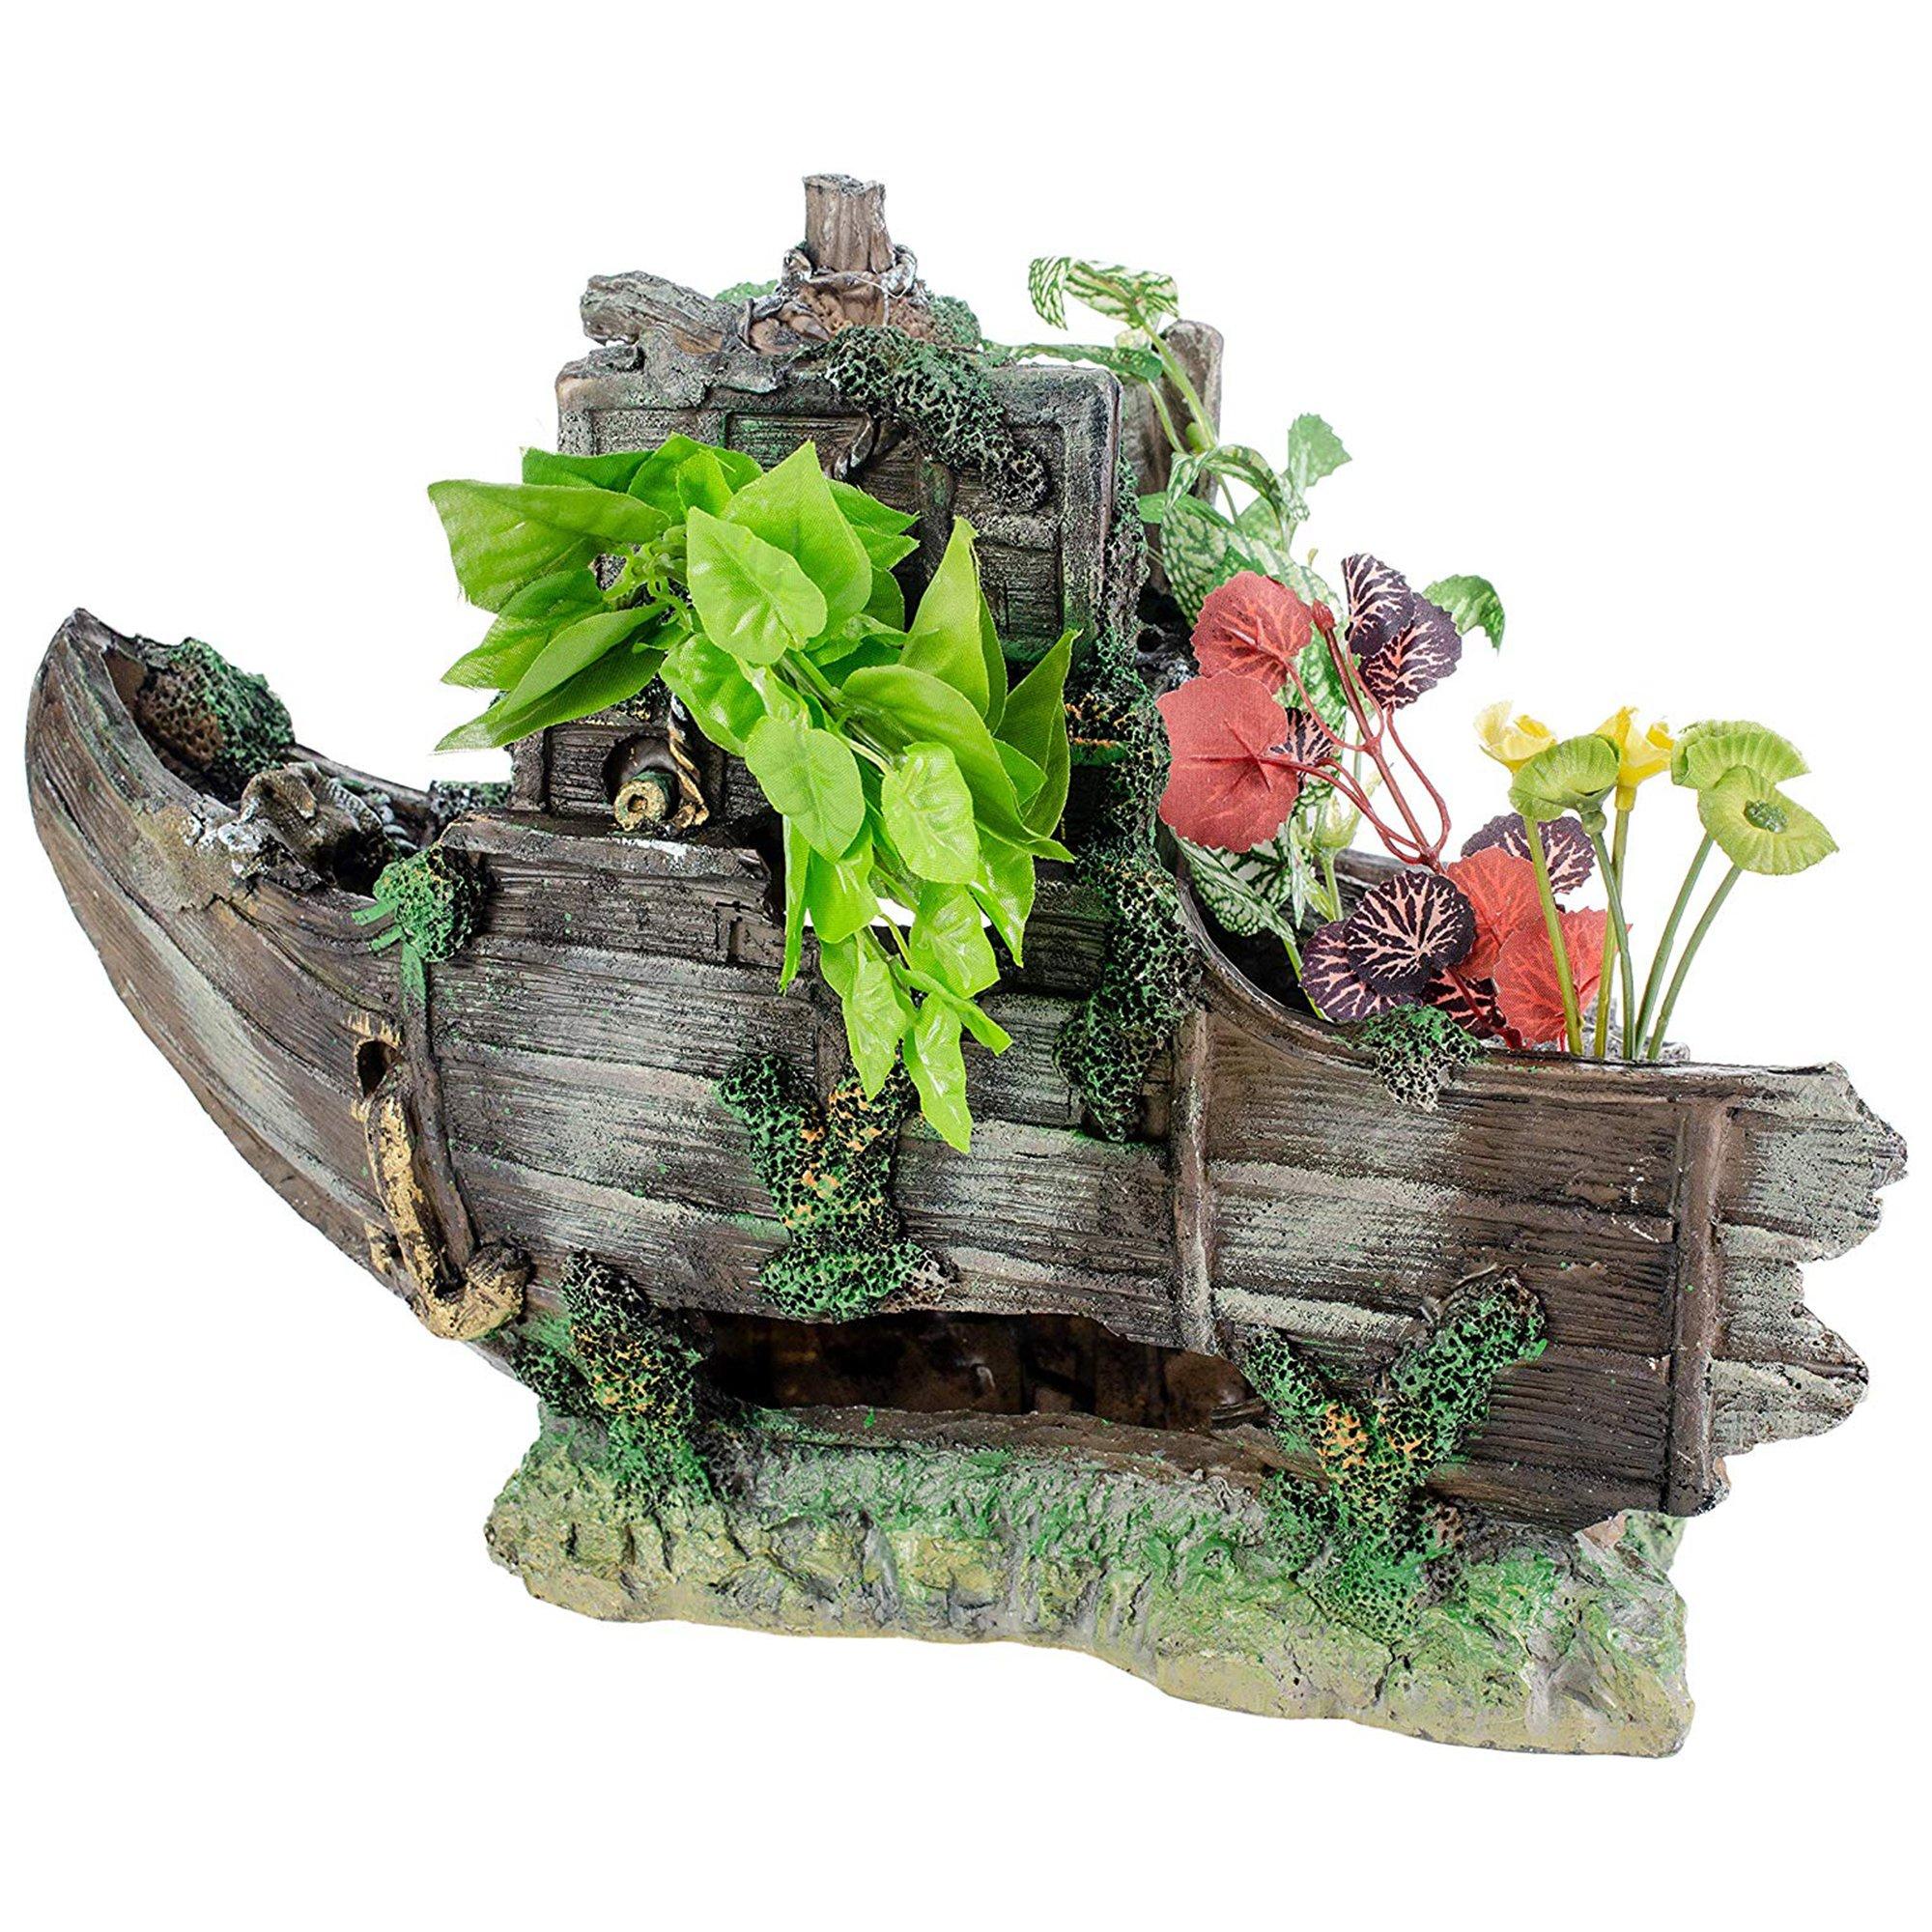 Penn plax sunken gardens shipwreck bow aquarium decor petco for Petco fish tank decor